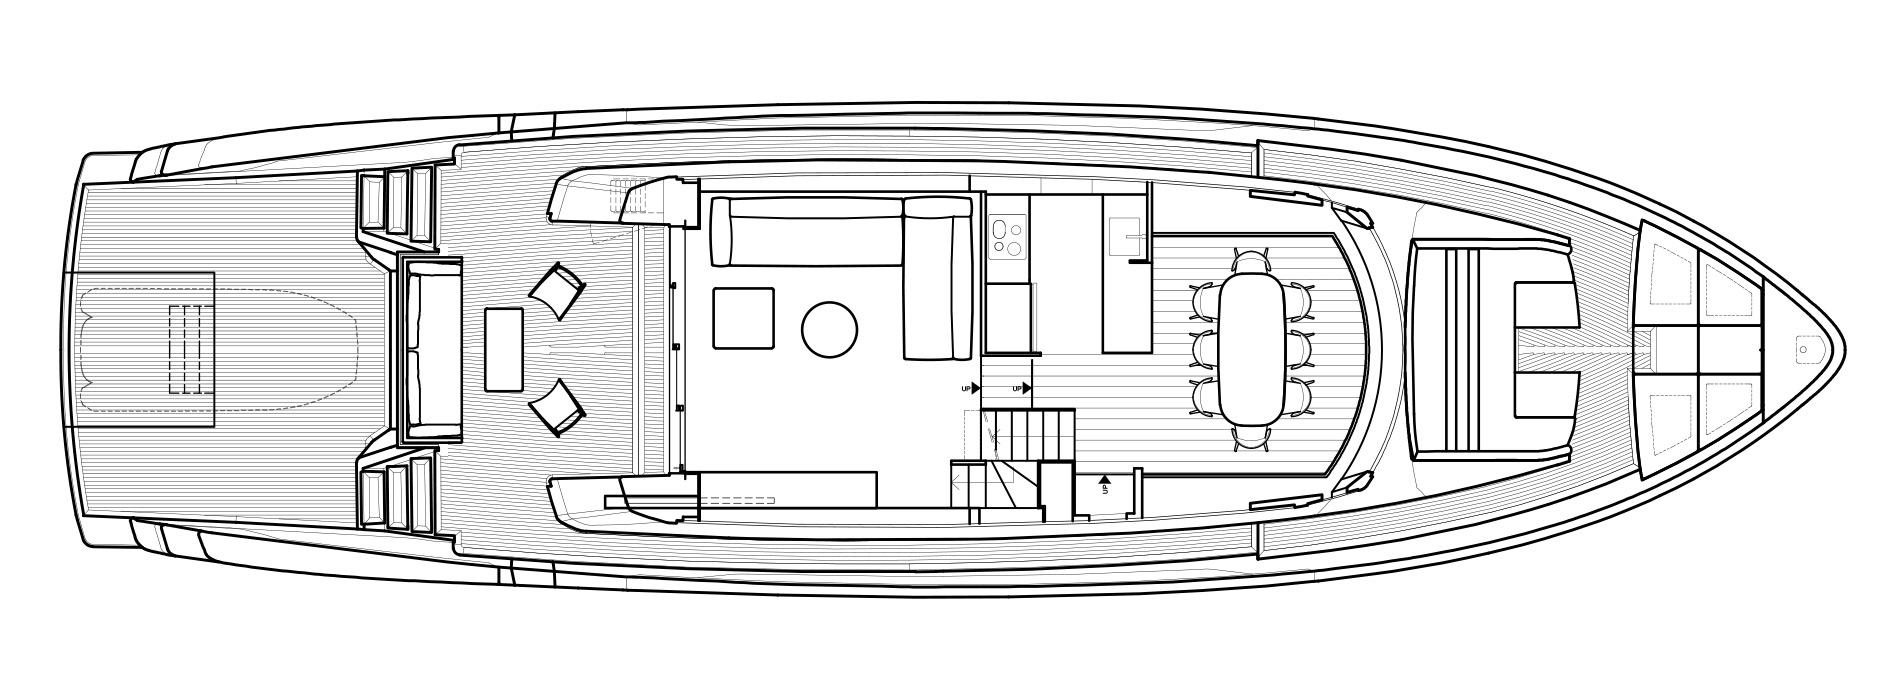 Sanlorenzo Yachts SX76 Главная палуба версия B